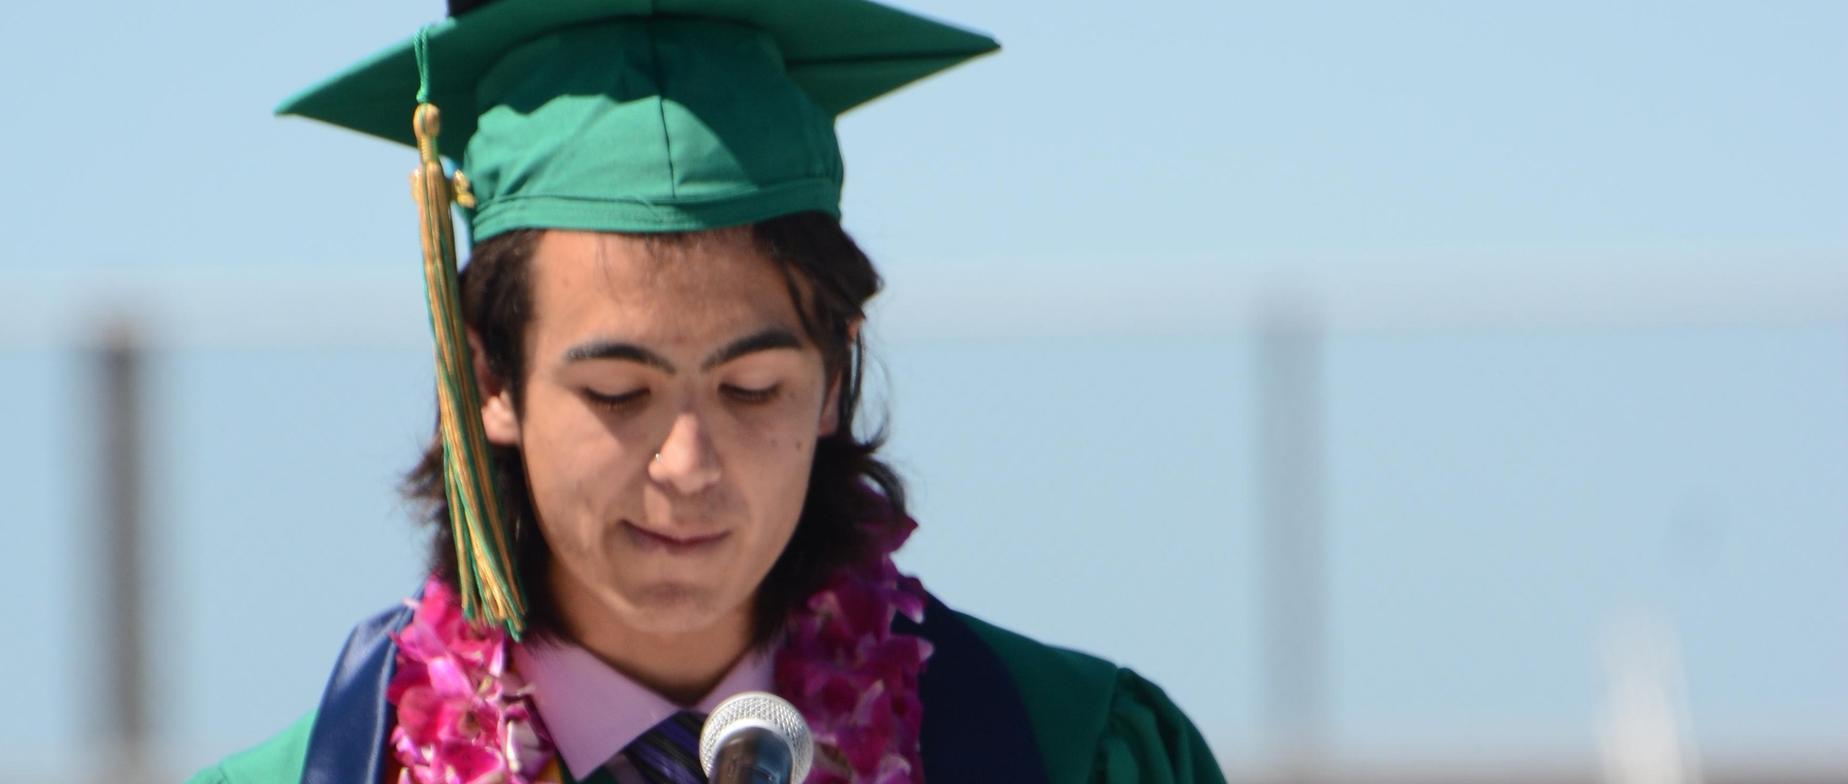 Student at Graduation Podium